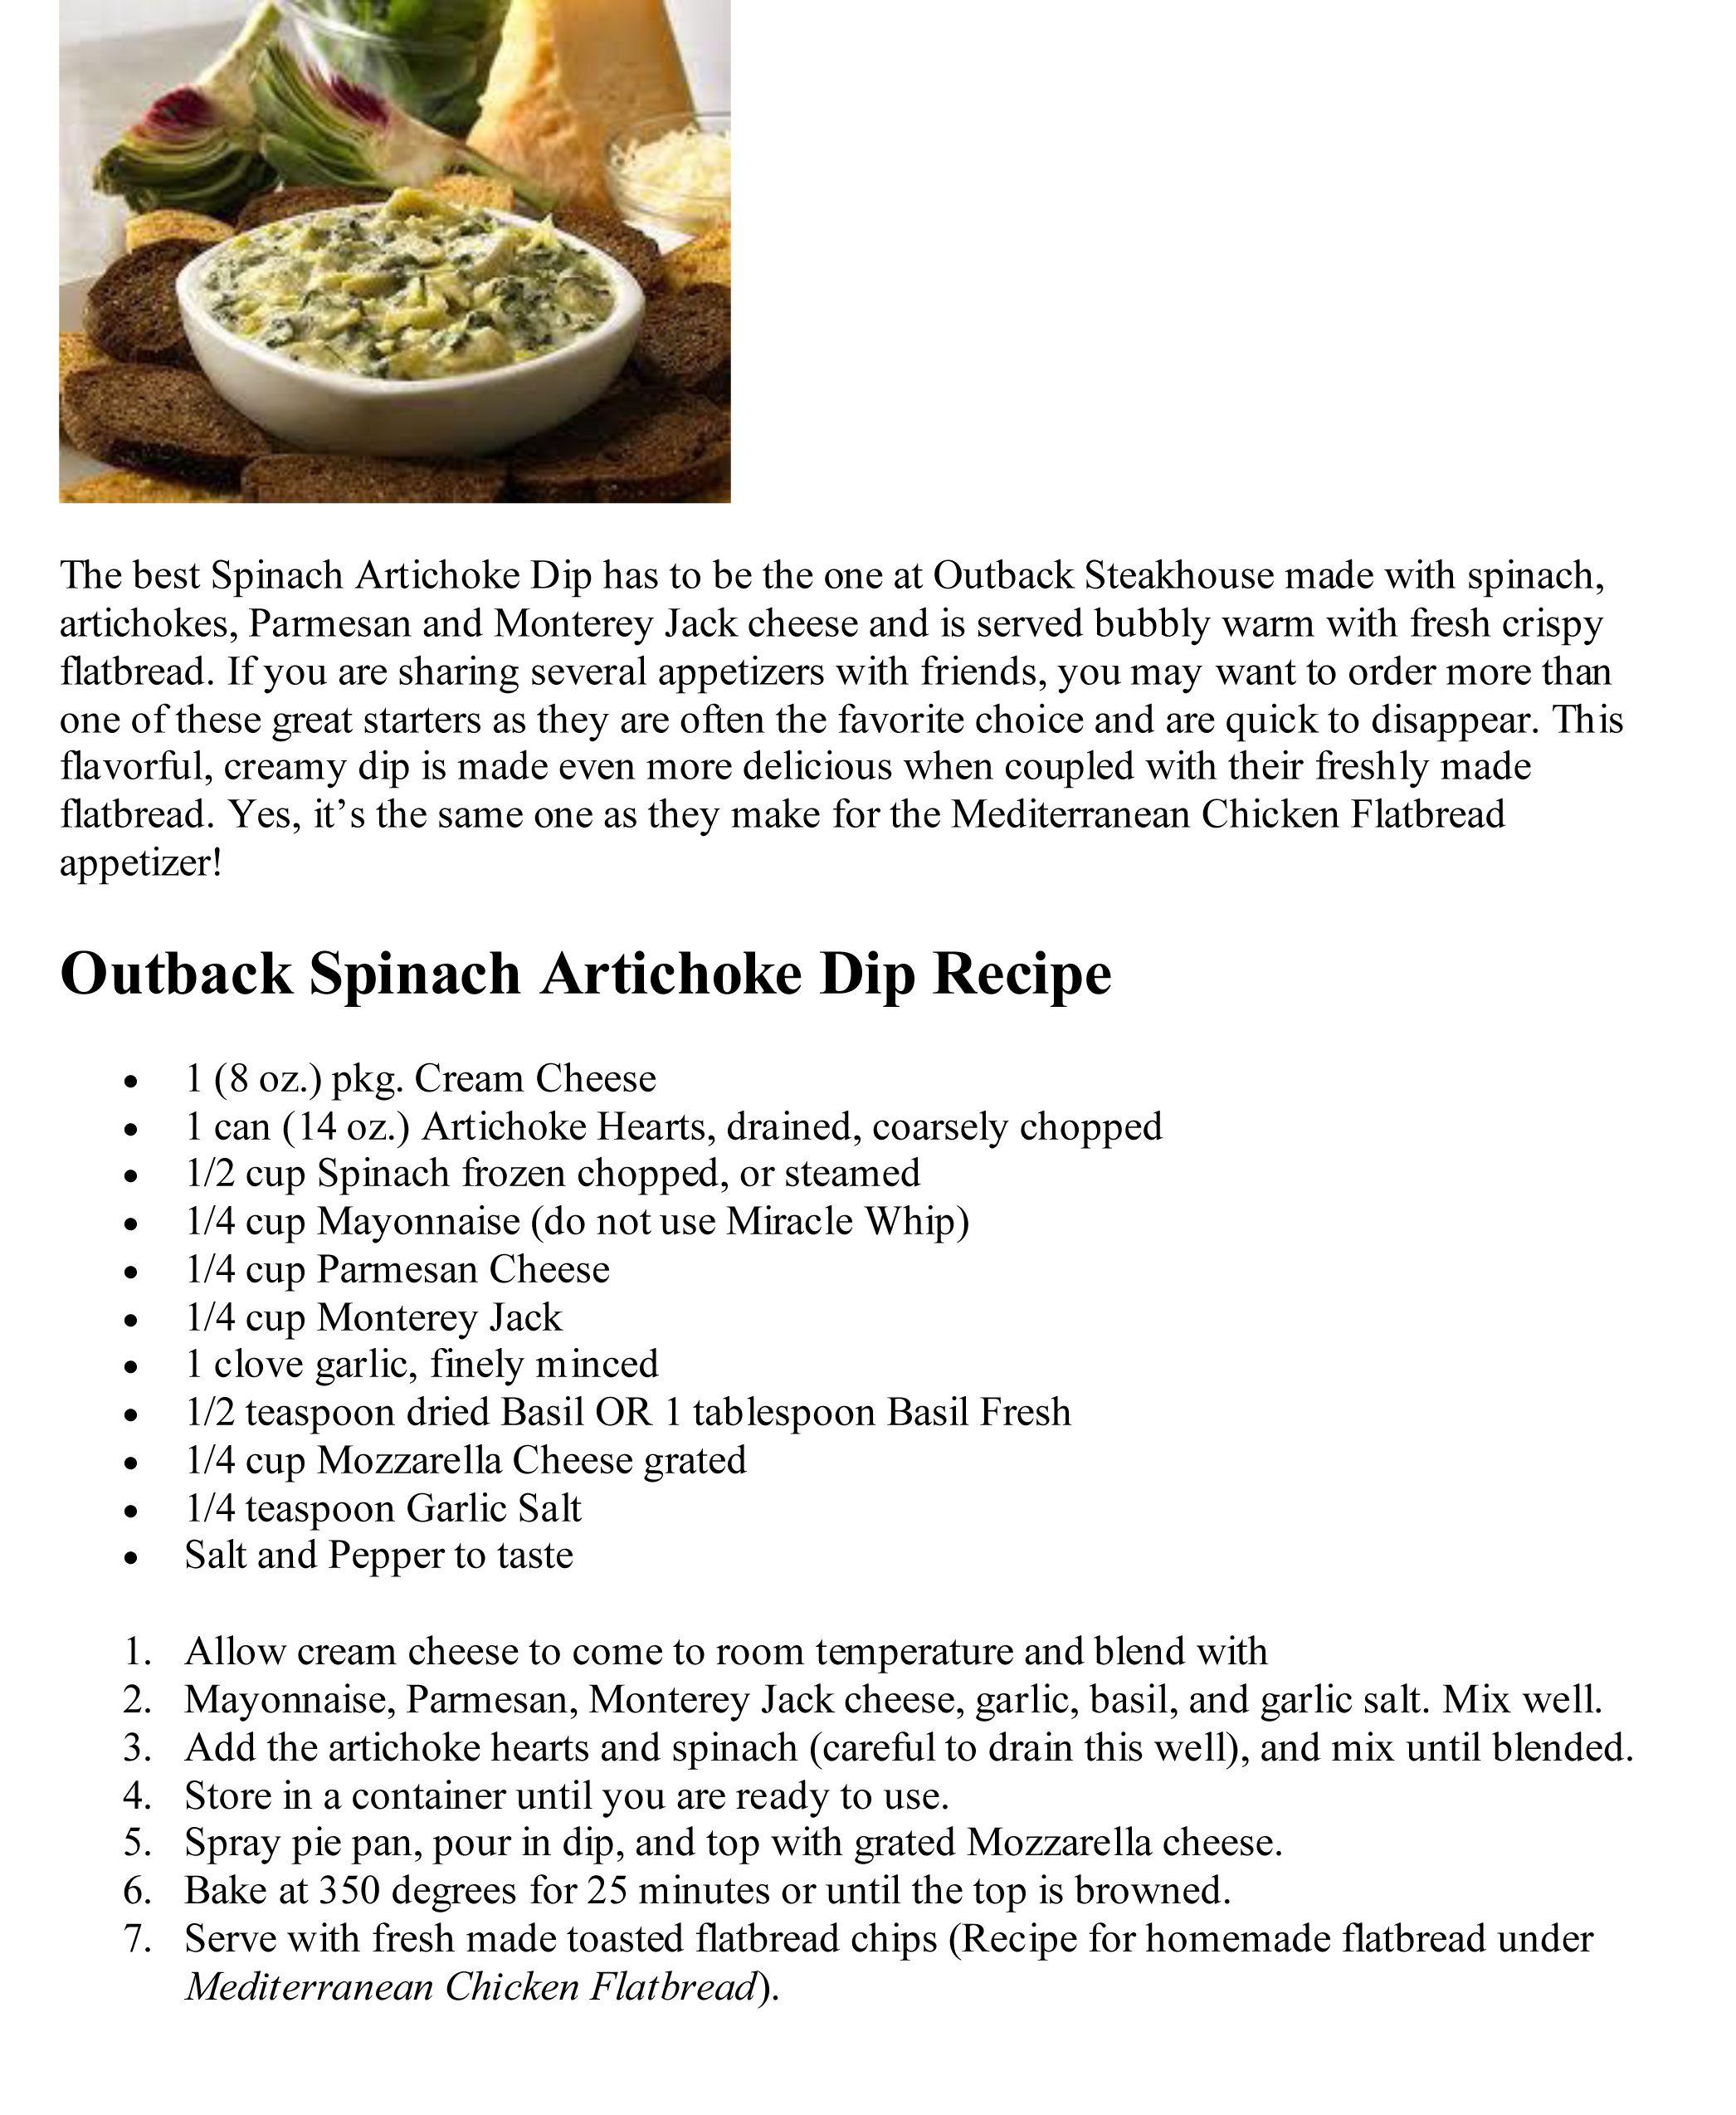 Outback Spinach Artichoke Dip | Delish! | Pinterest | Artichokes ...